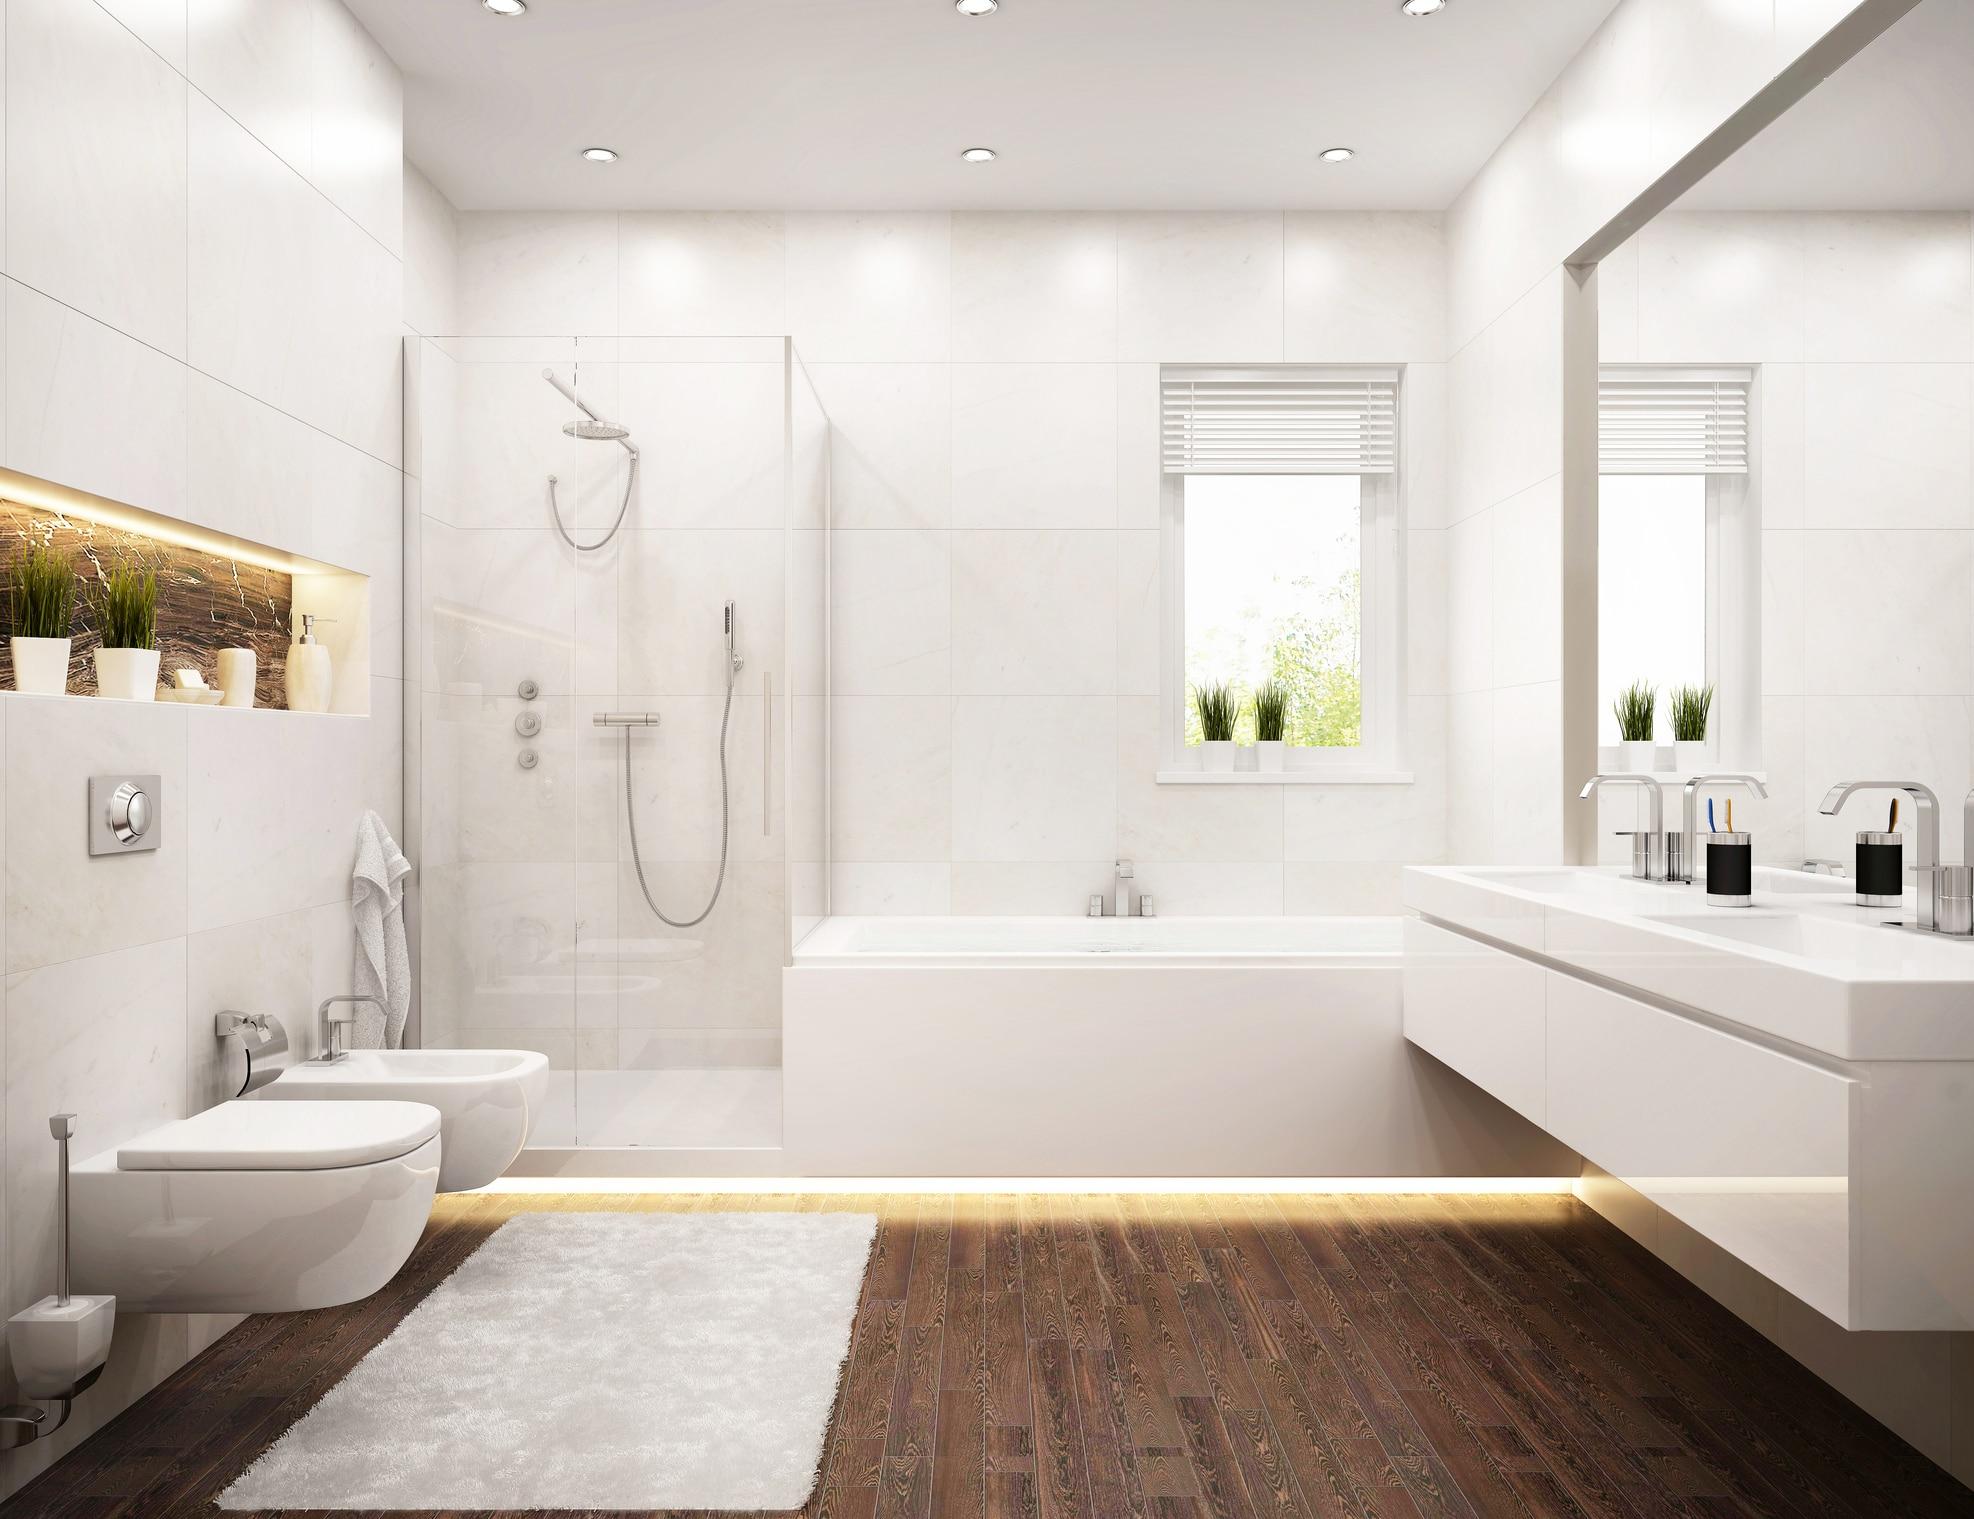 Une salle de bain luxueuse